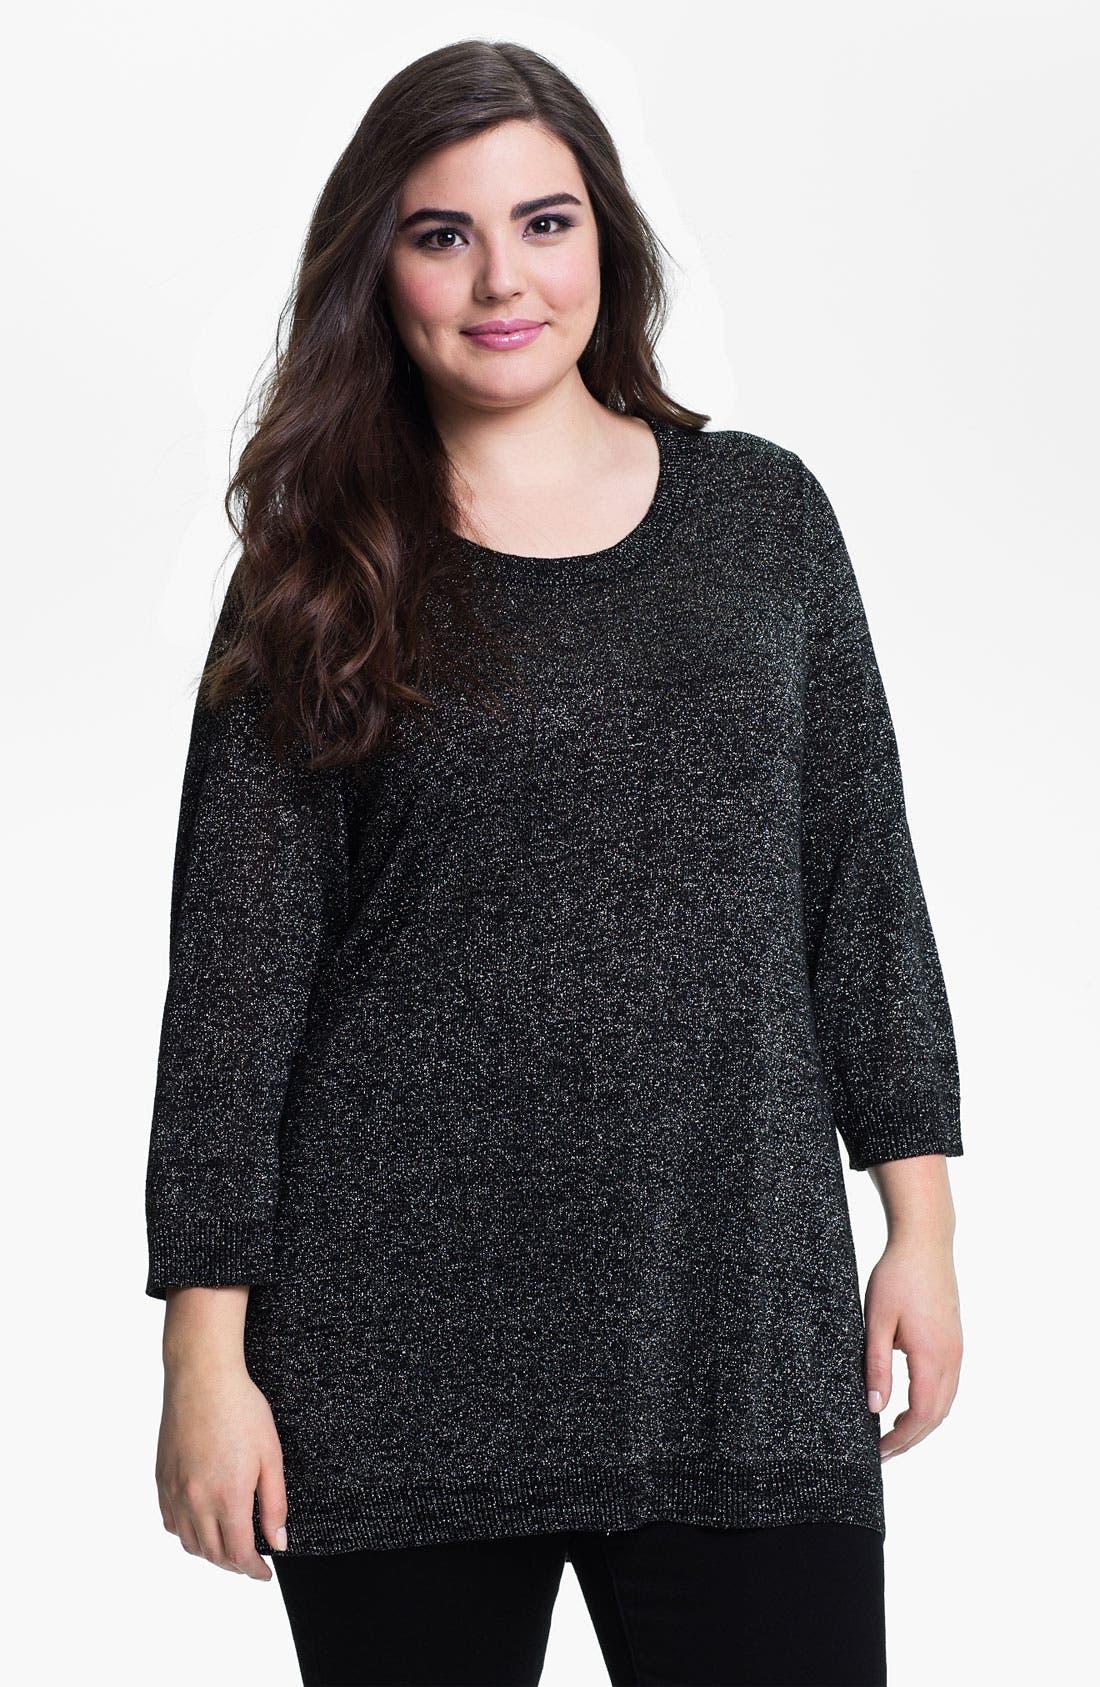 Alternate Image 1 Selected - Evans Metallic Knit Sweater (Plus Size)